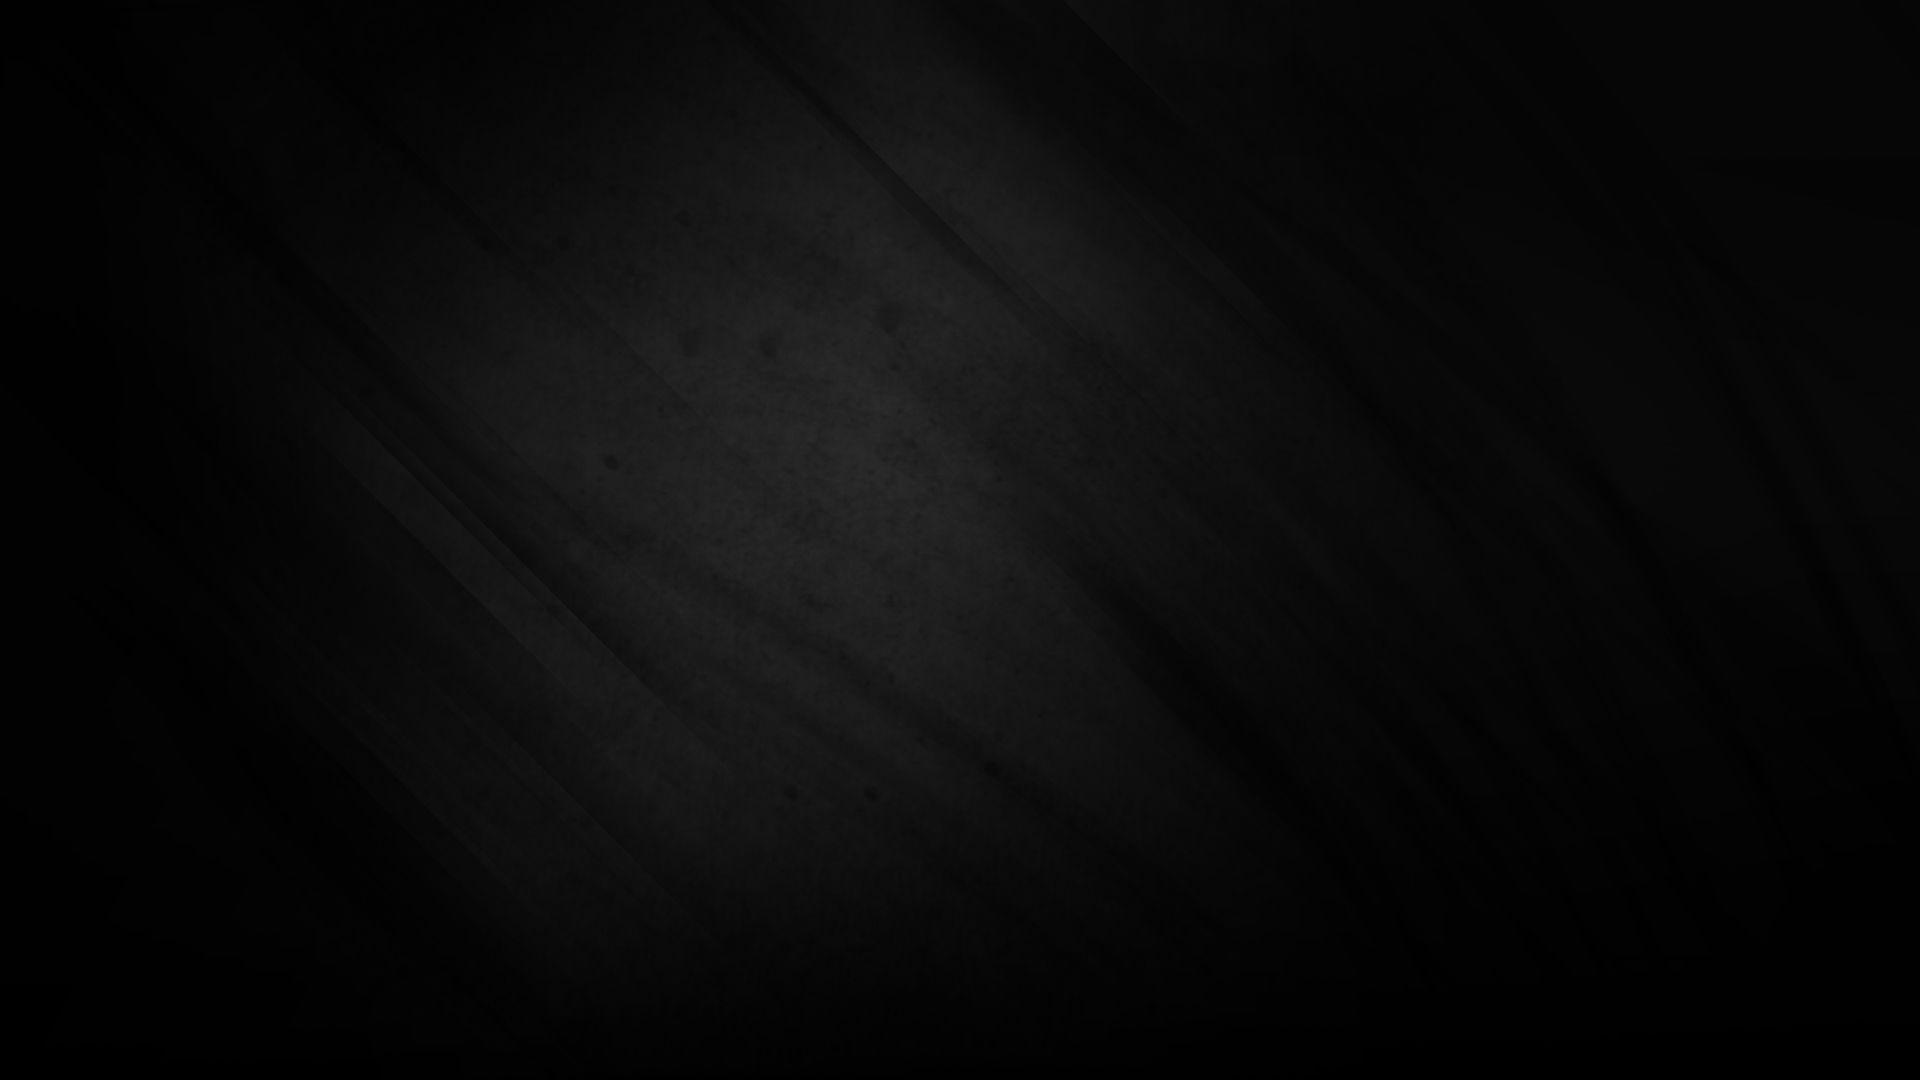 black wallpaper background pc - photo #28